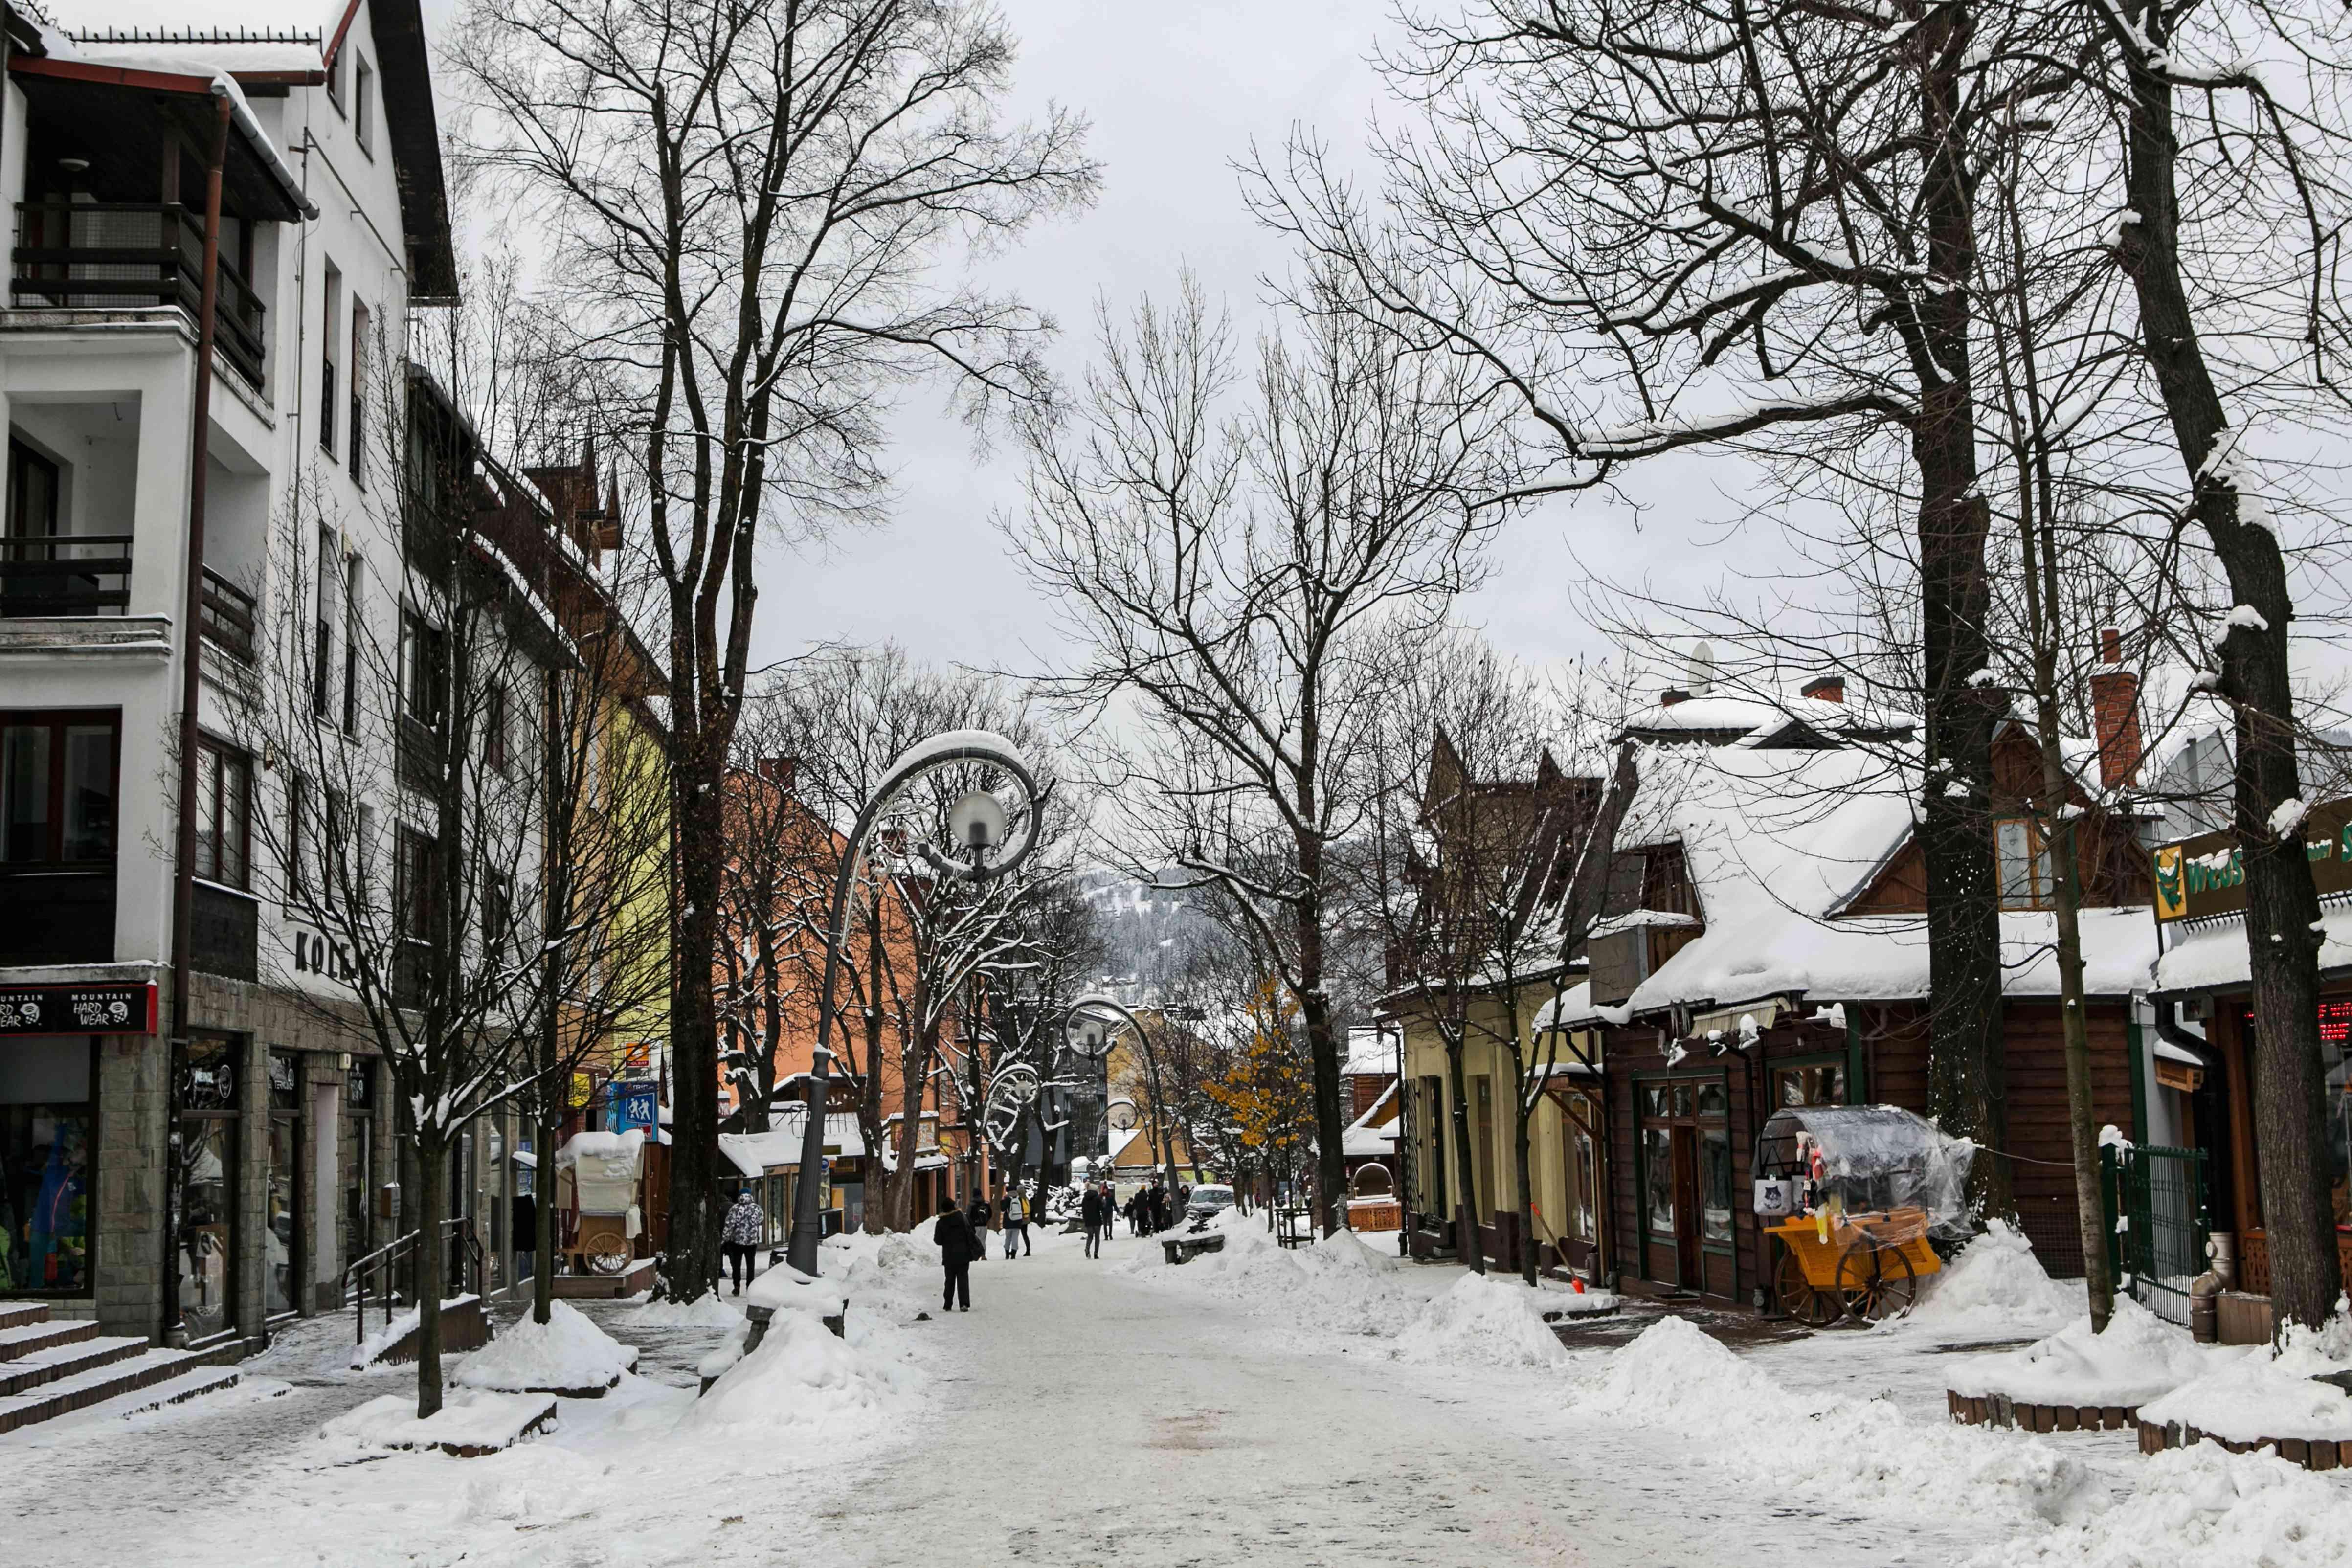 Snow covered Krupowki street in Zakopane, Poland